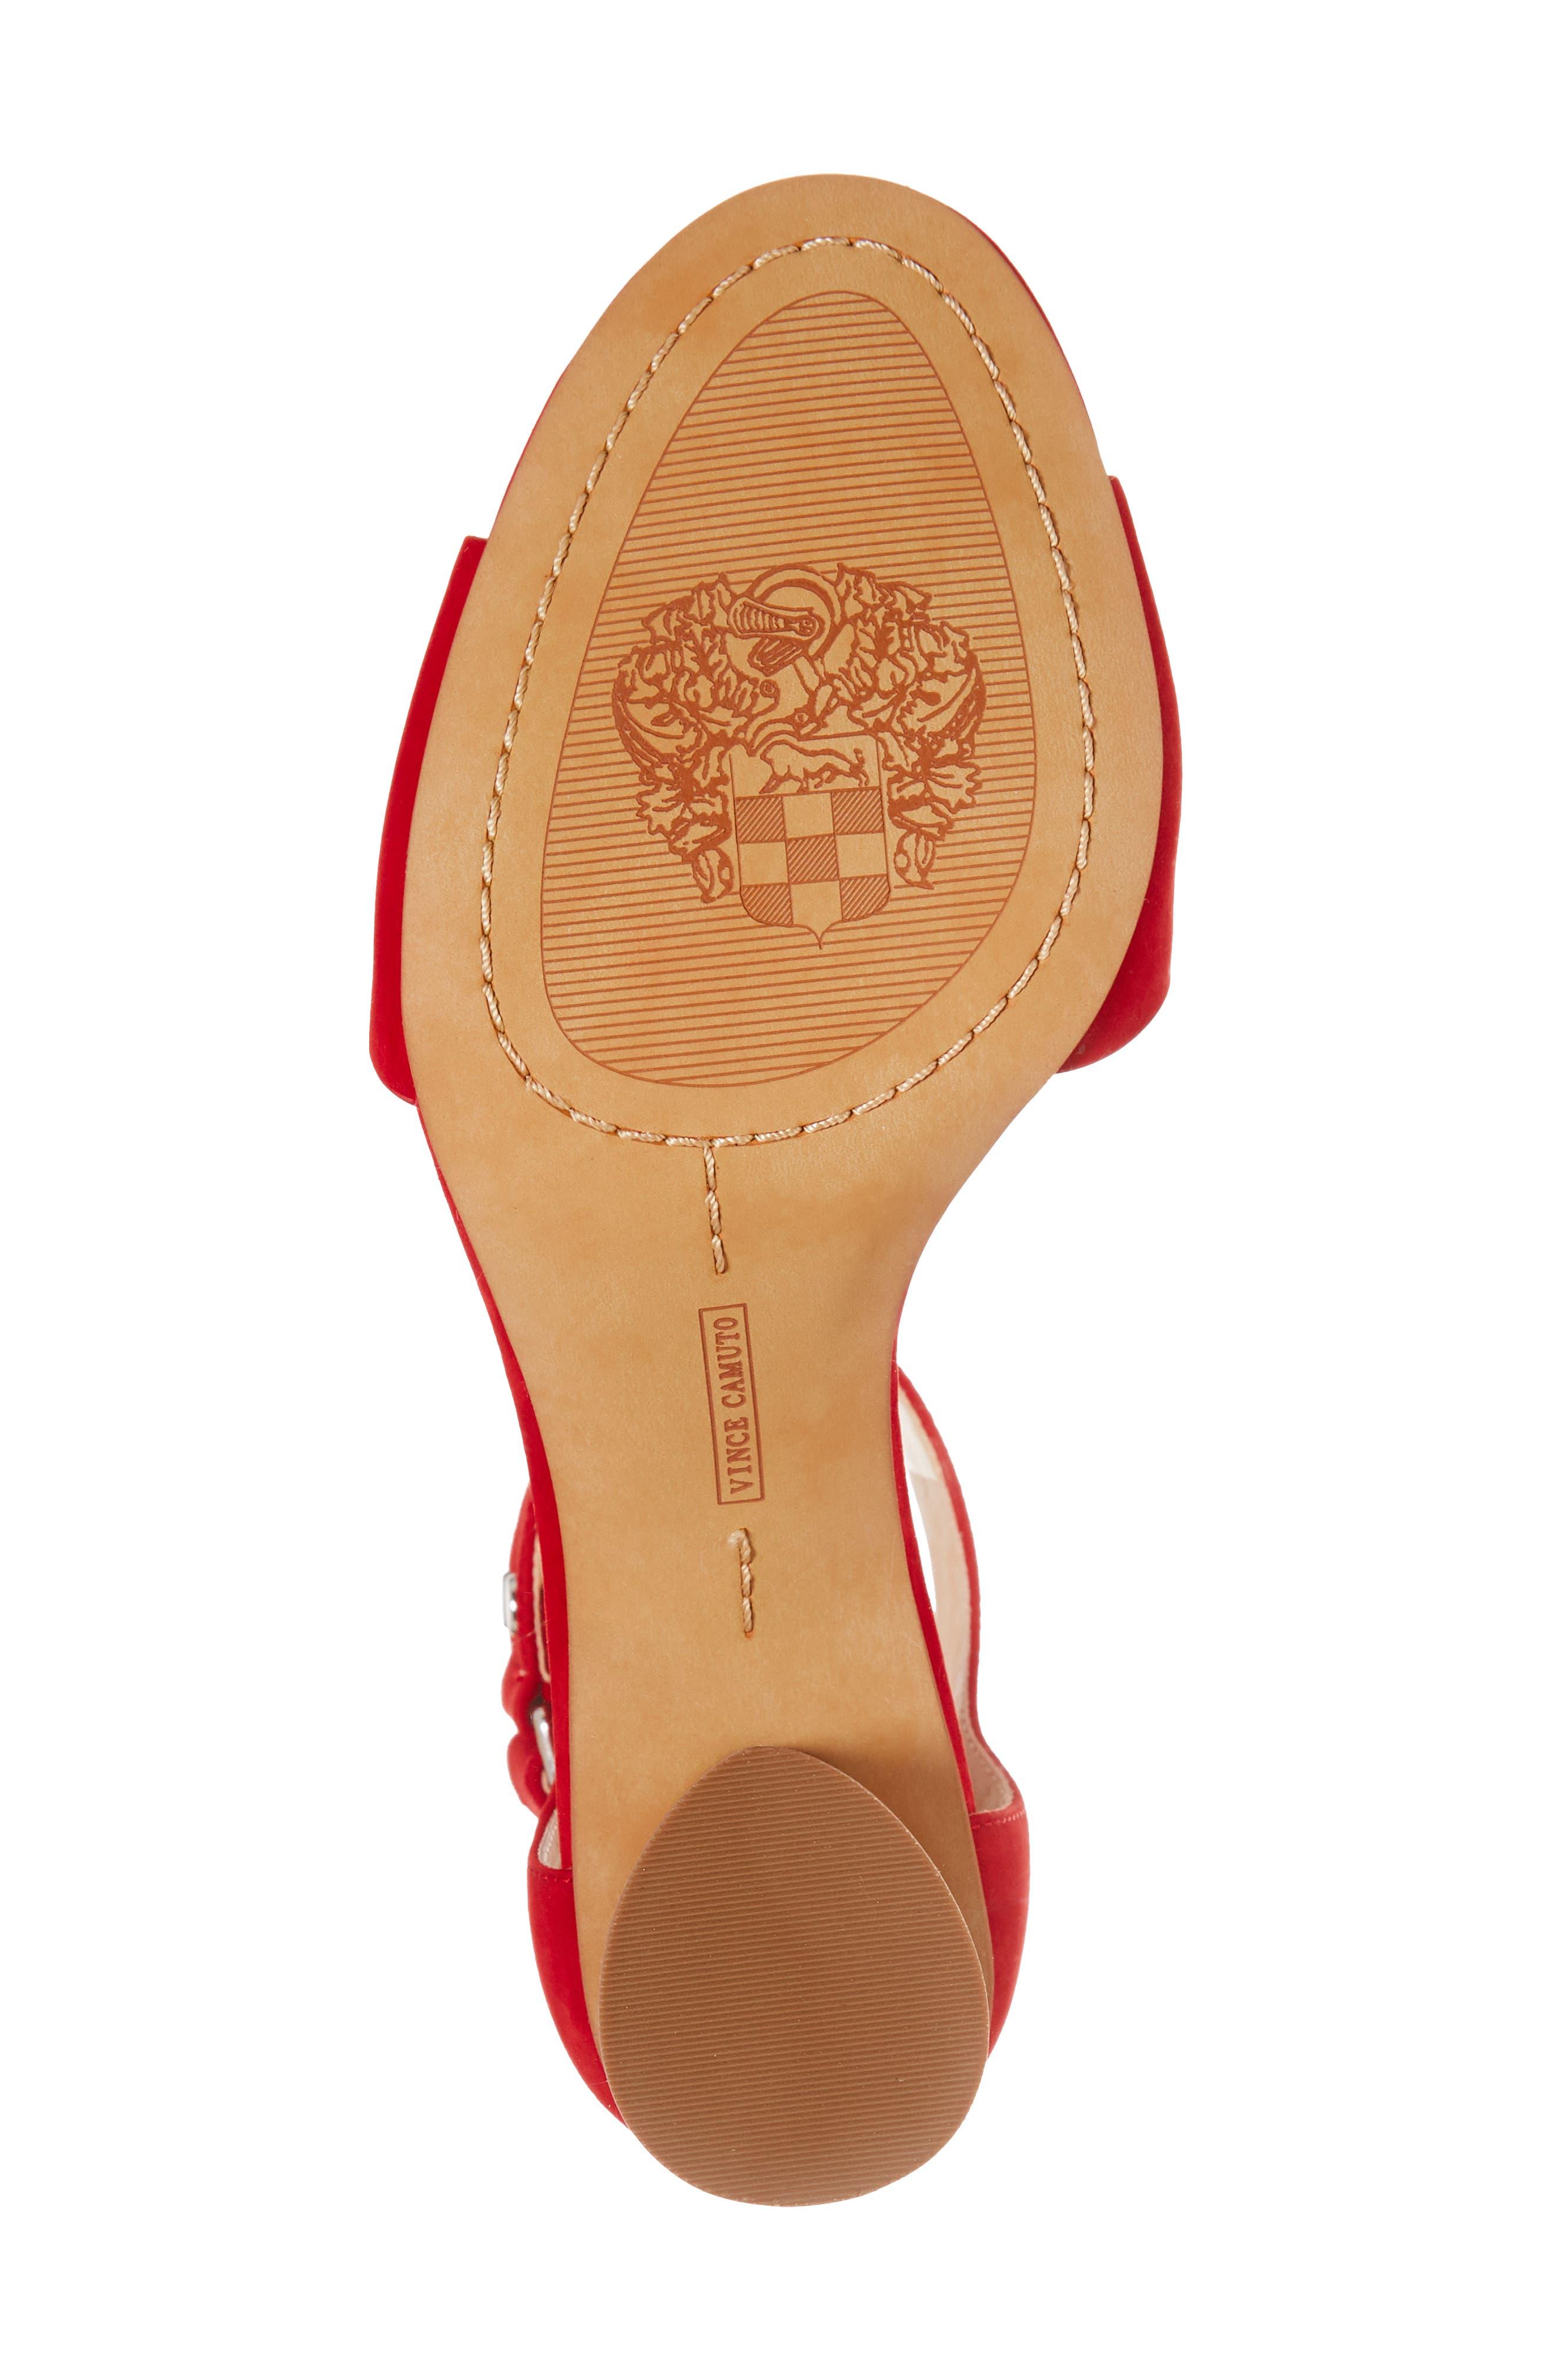 Jannali Ankle Strap Sandal,                             Alternate thumbnail 6, color,                             Cherry Red Leather